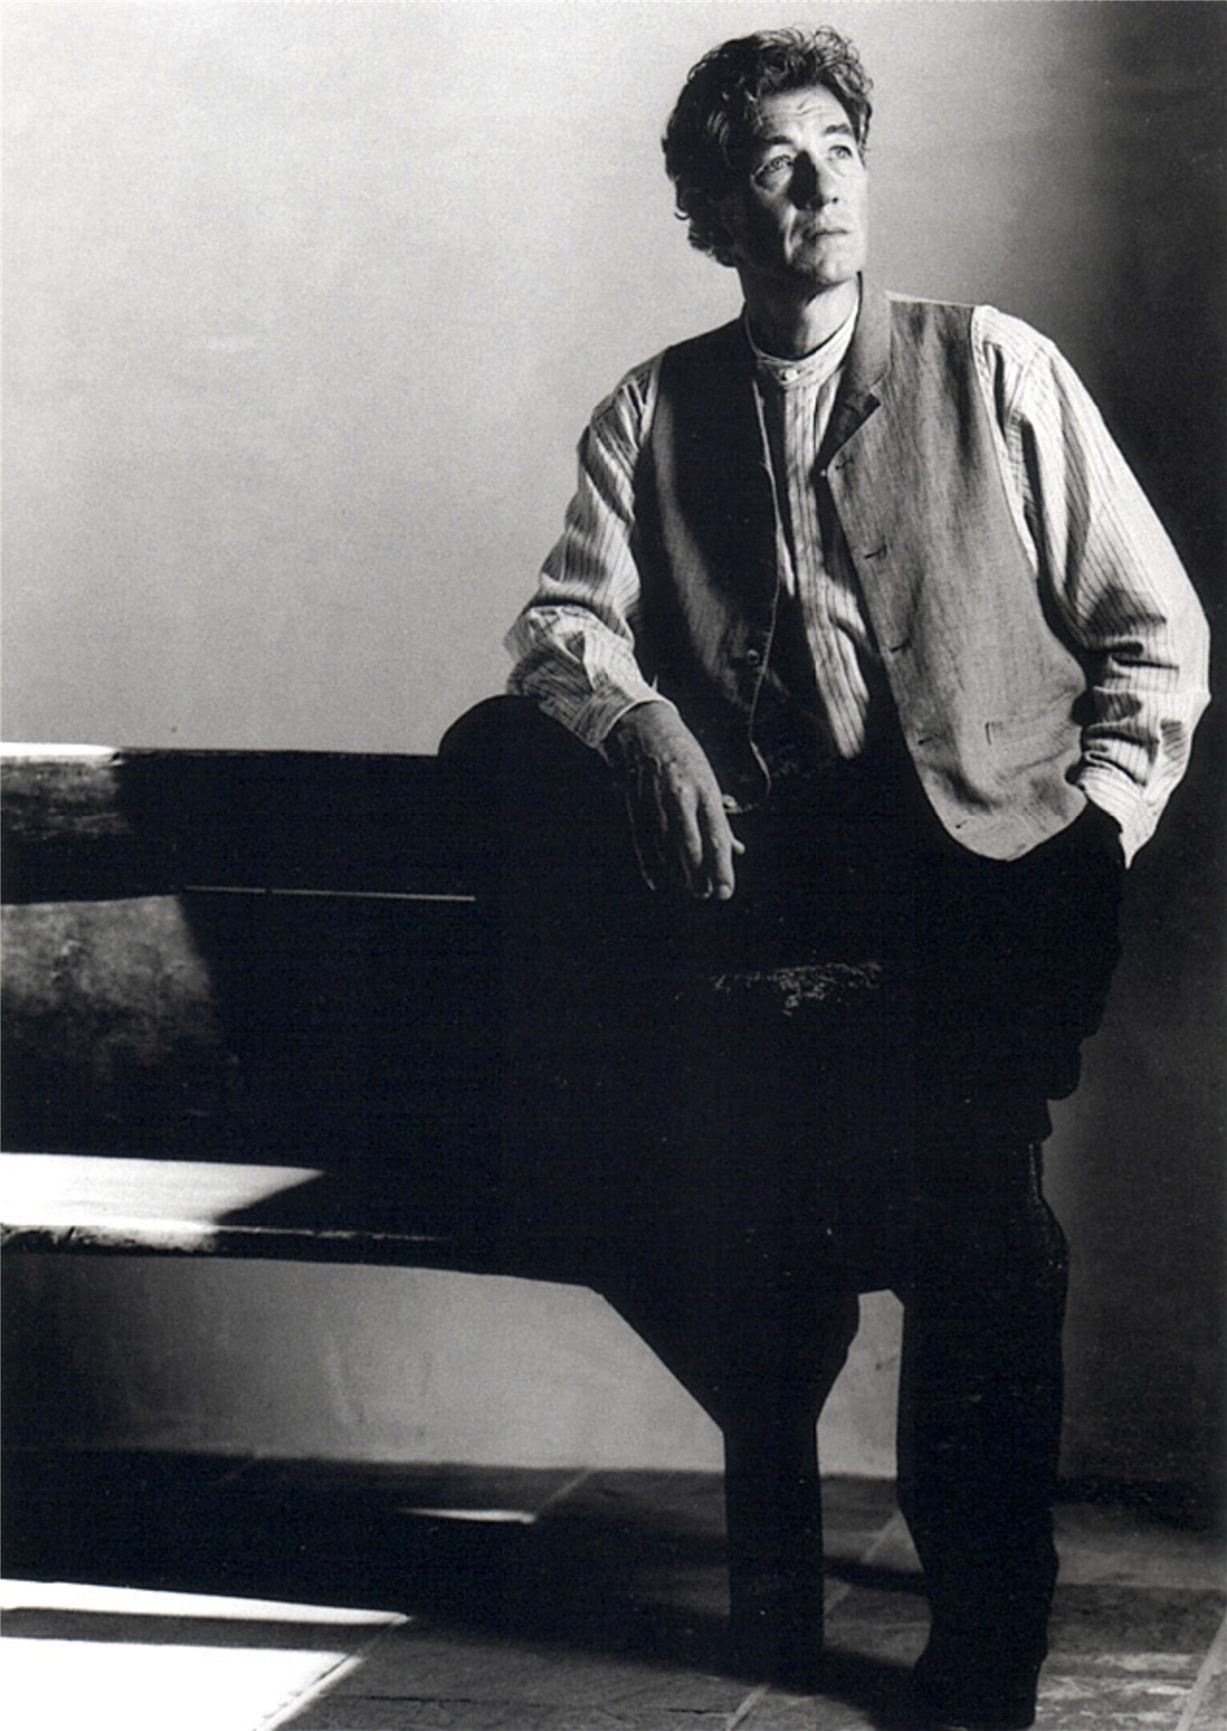 Ian McKellan / Иэн МакКеллен - портрет фотографа Грега Гормана / Greg Gorman